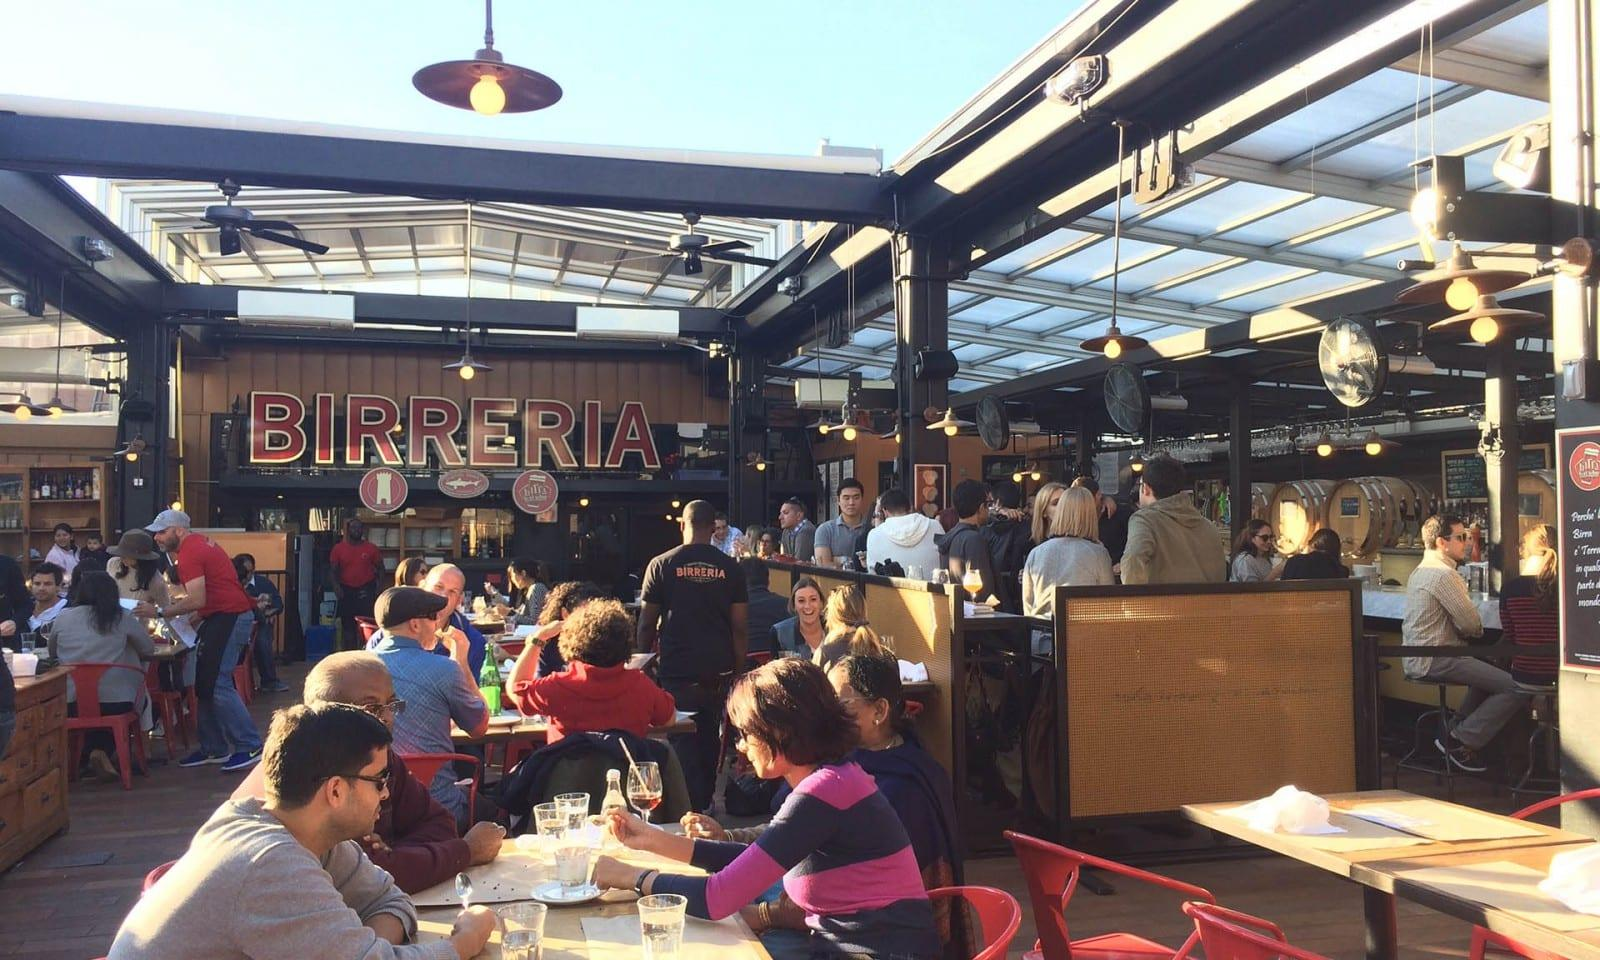 Visitors at Birreria Rooftop Bar